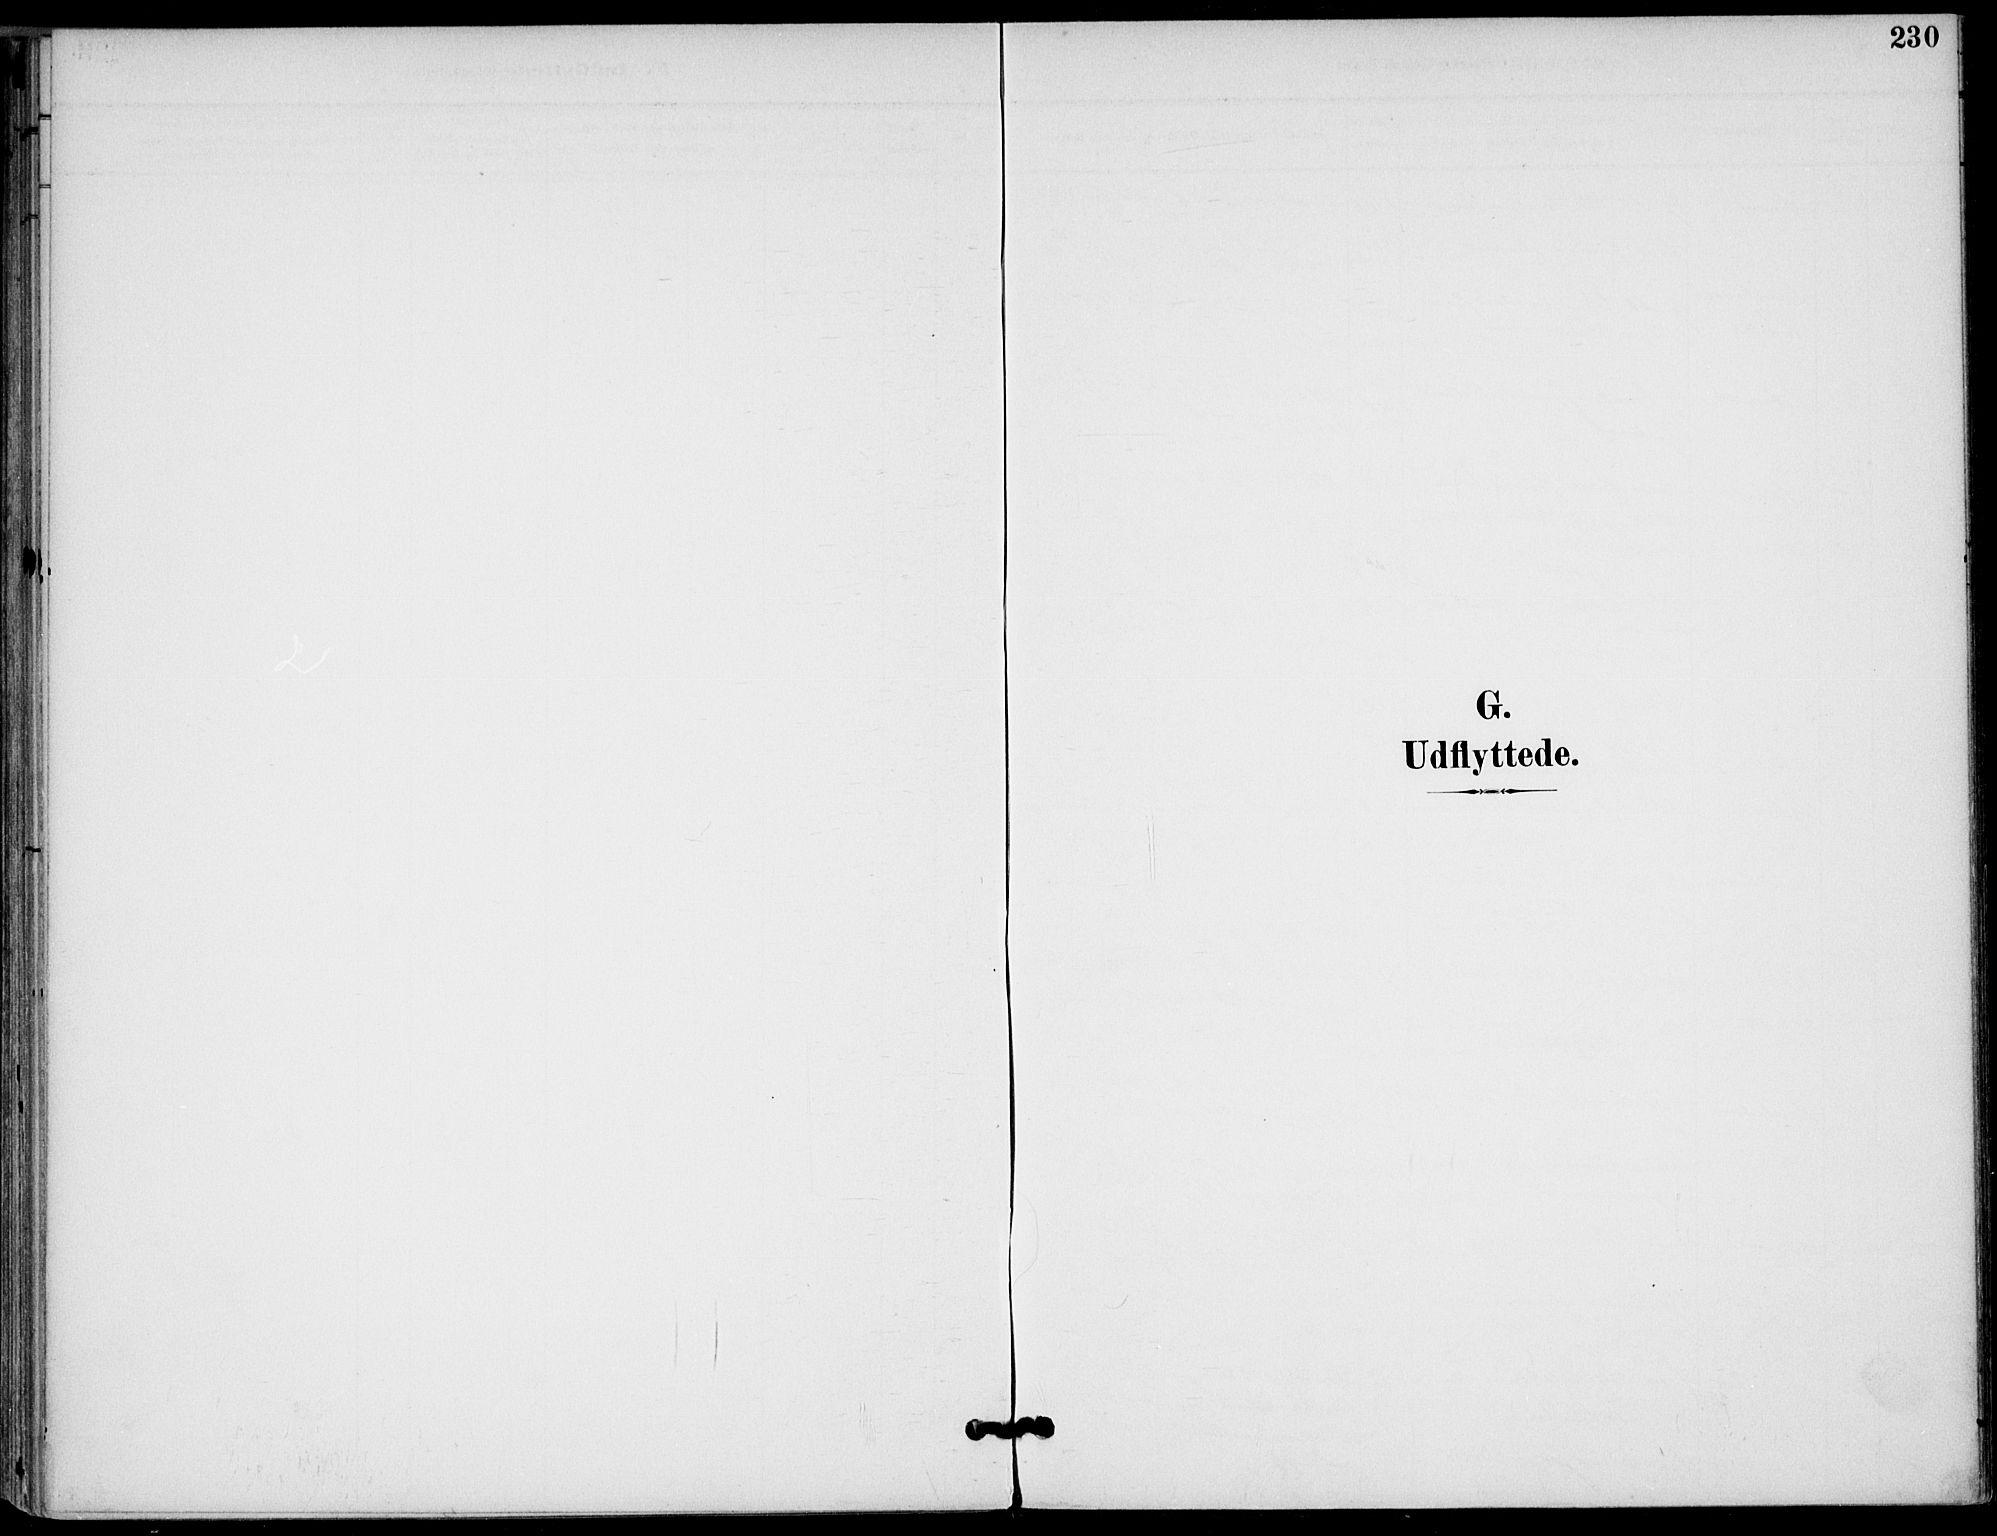 SAKO, Drangedal kirkebøker, F/Fa/L0012: Ministerialbok nr. 12, 1895-1905, s. 230